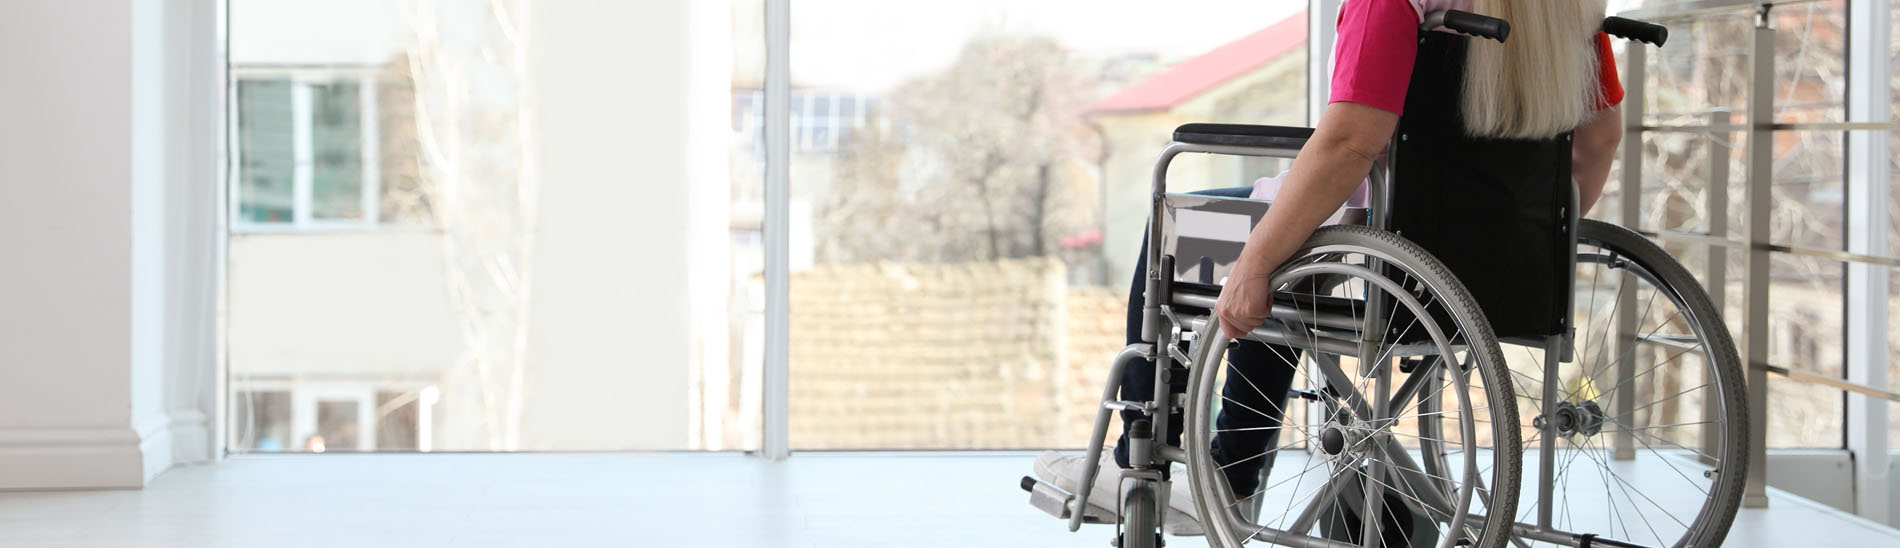 Invalideces SFC, SQ y FM